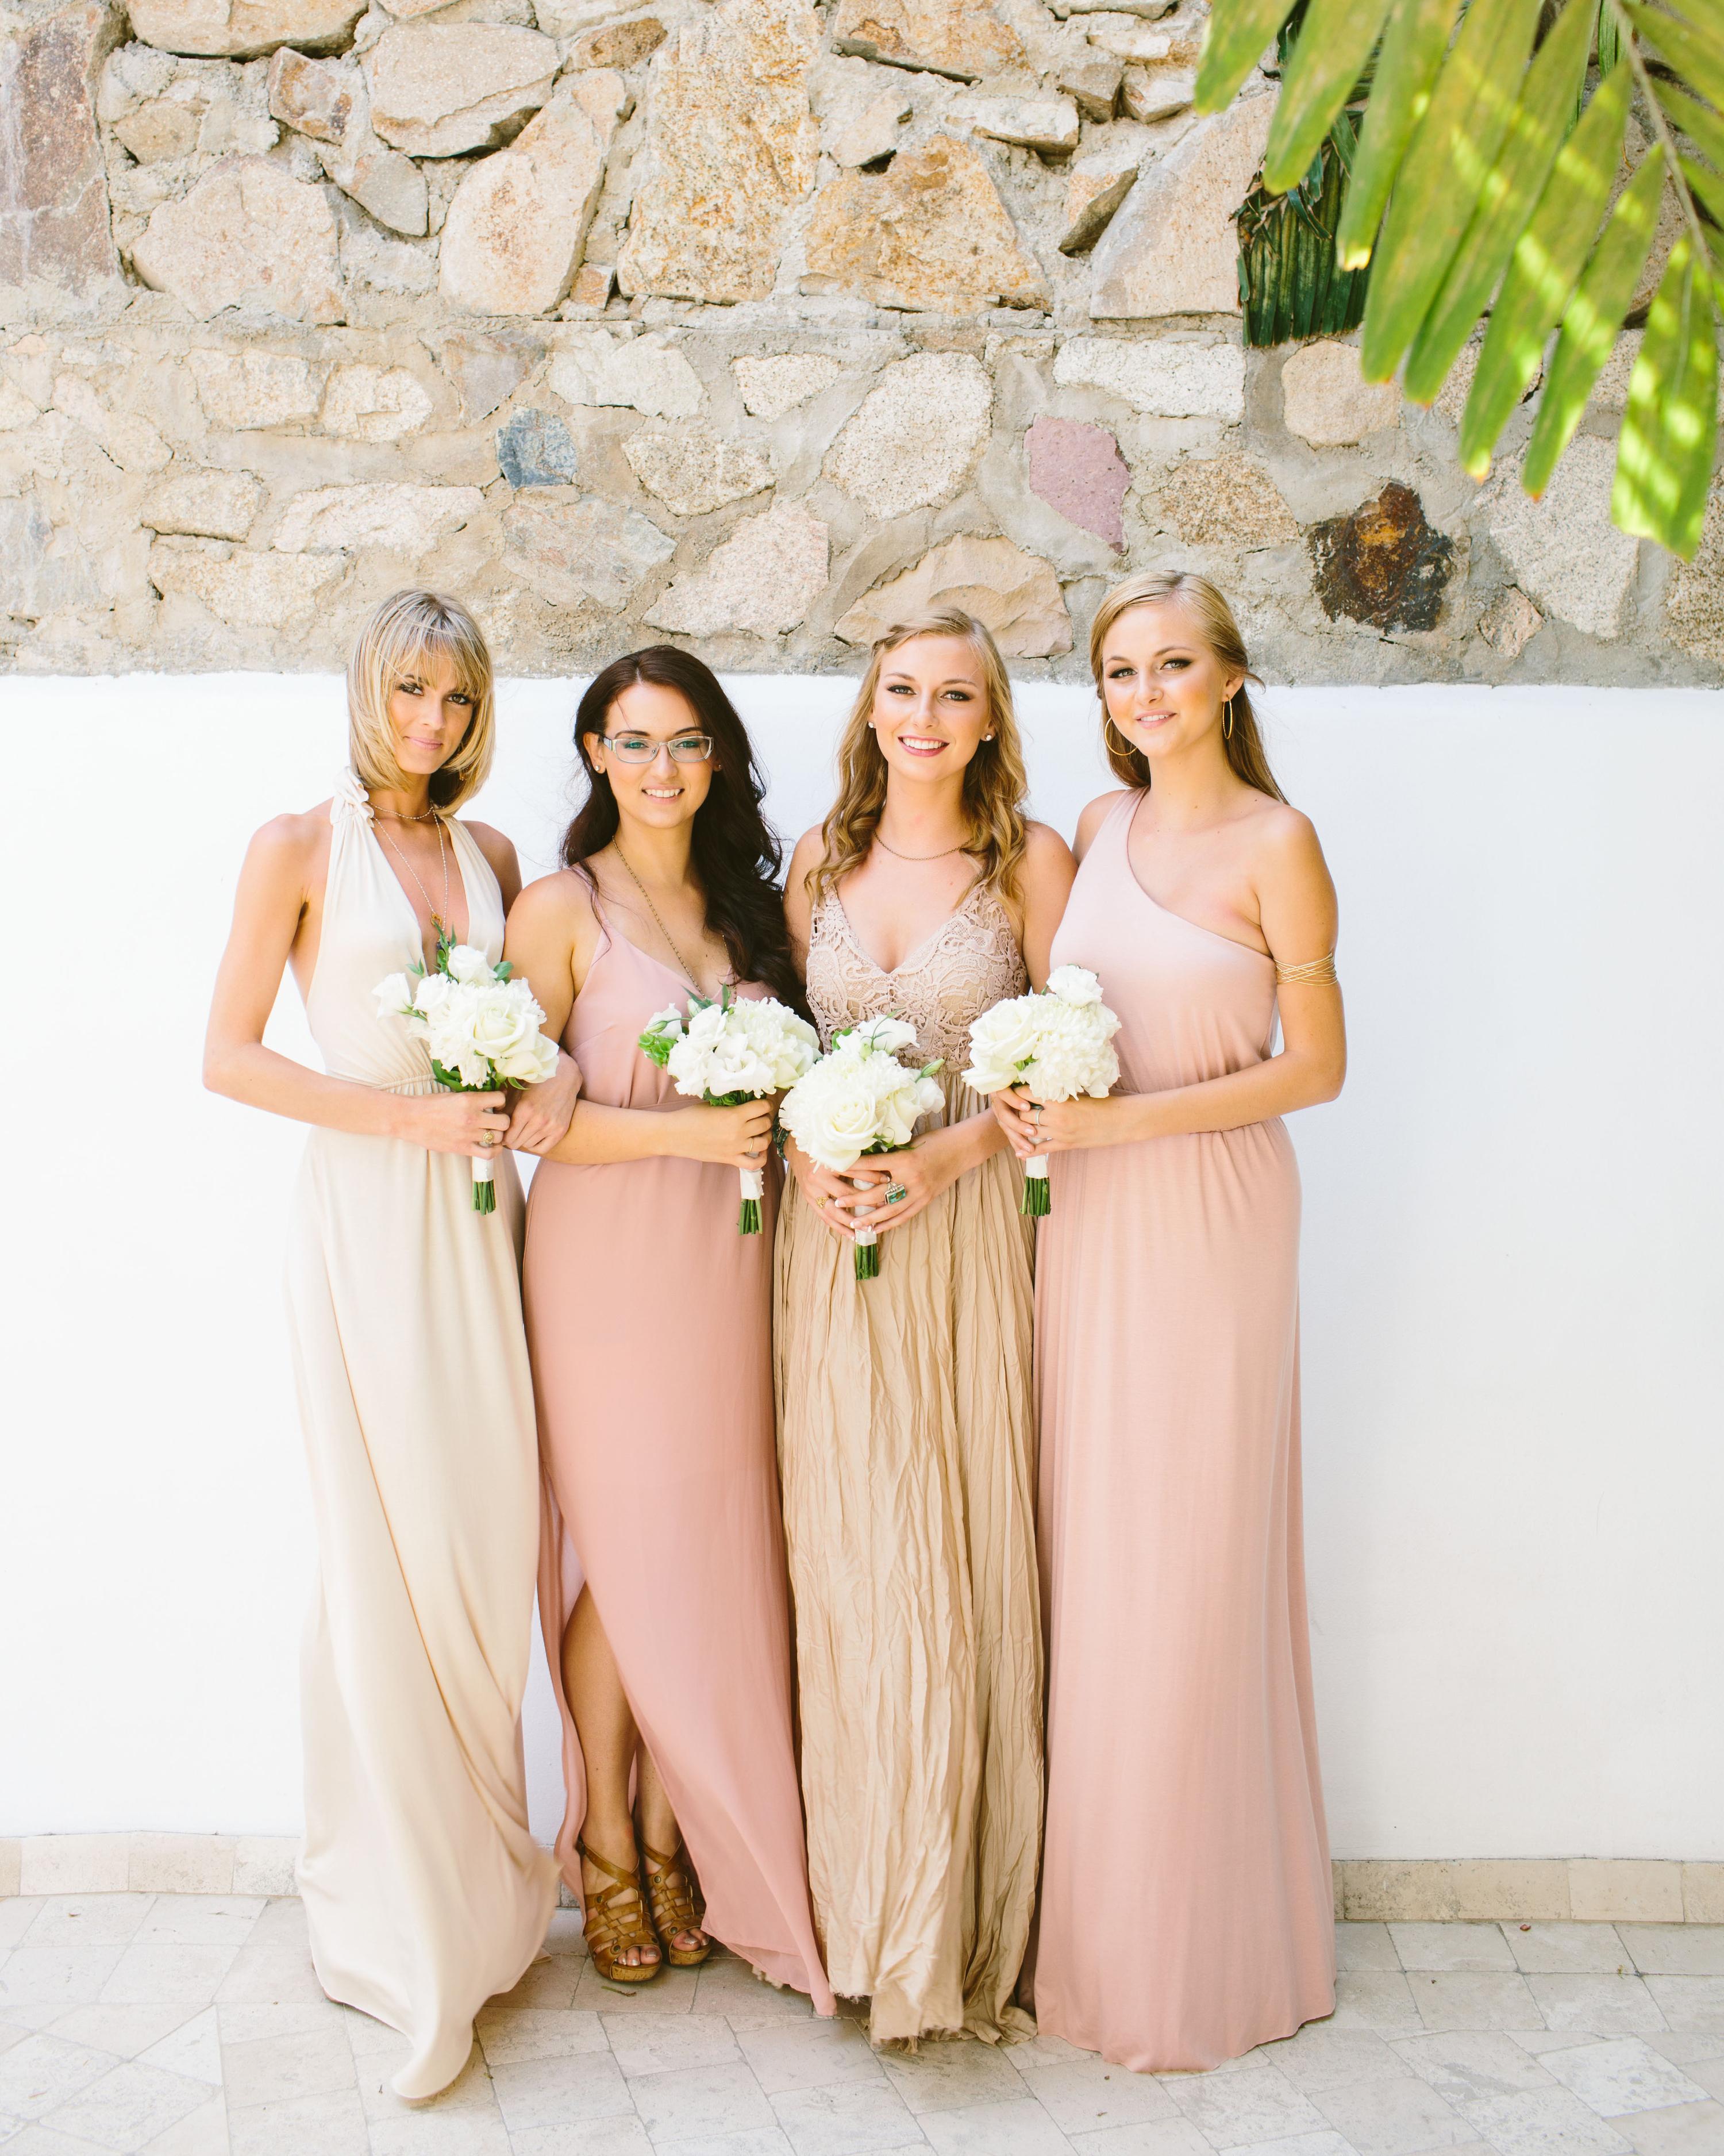 ali-jess-wedding-bridesmaids-265-002-s111717-1214.jpg